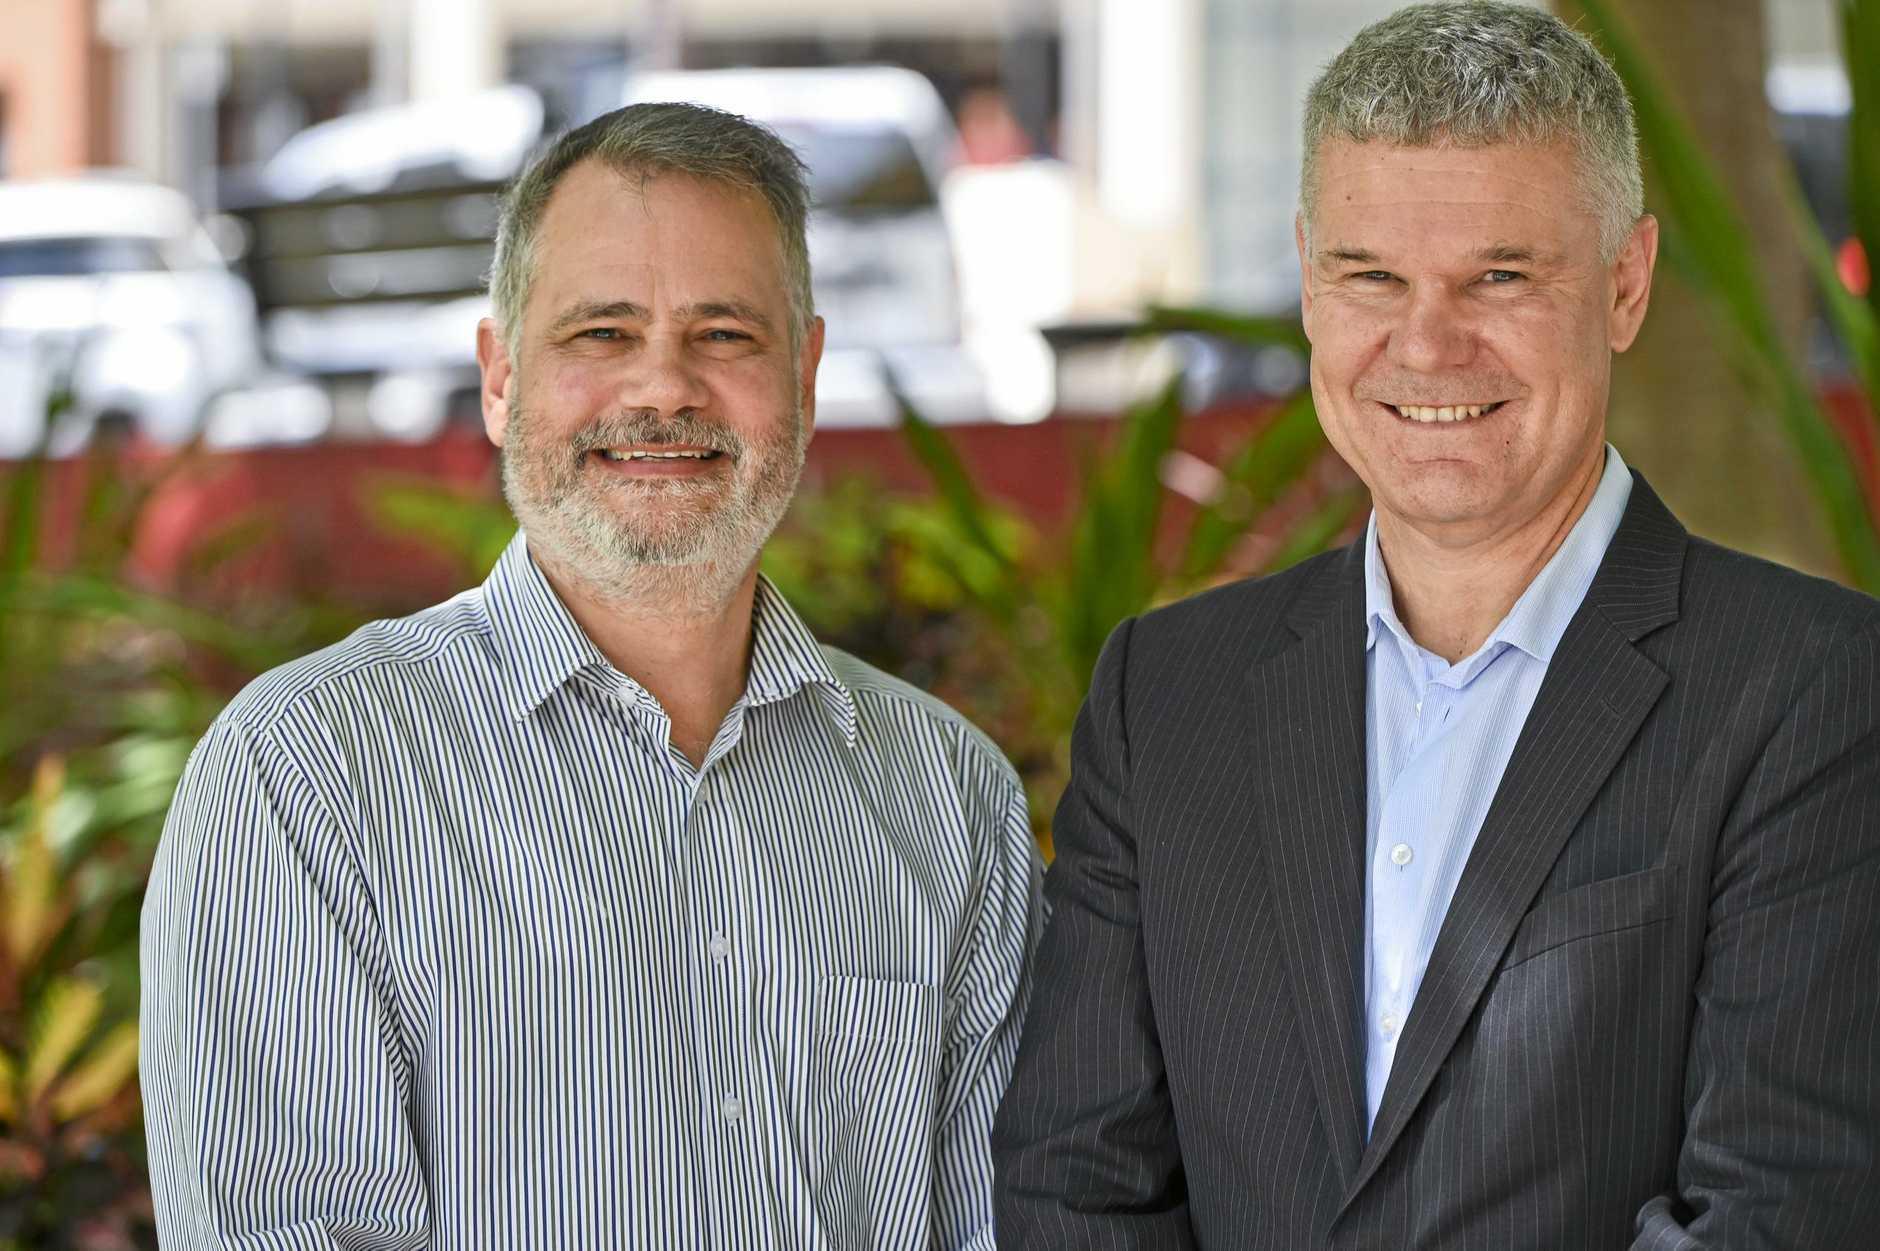 Ipswich Administrator Greg Chemello with new CEO David Farmer.